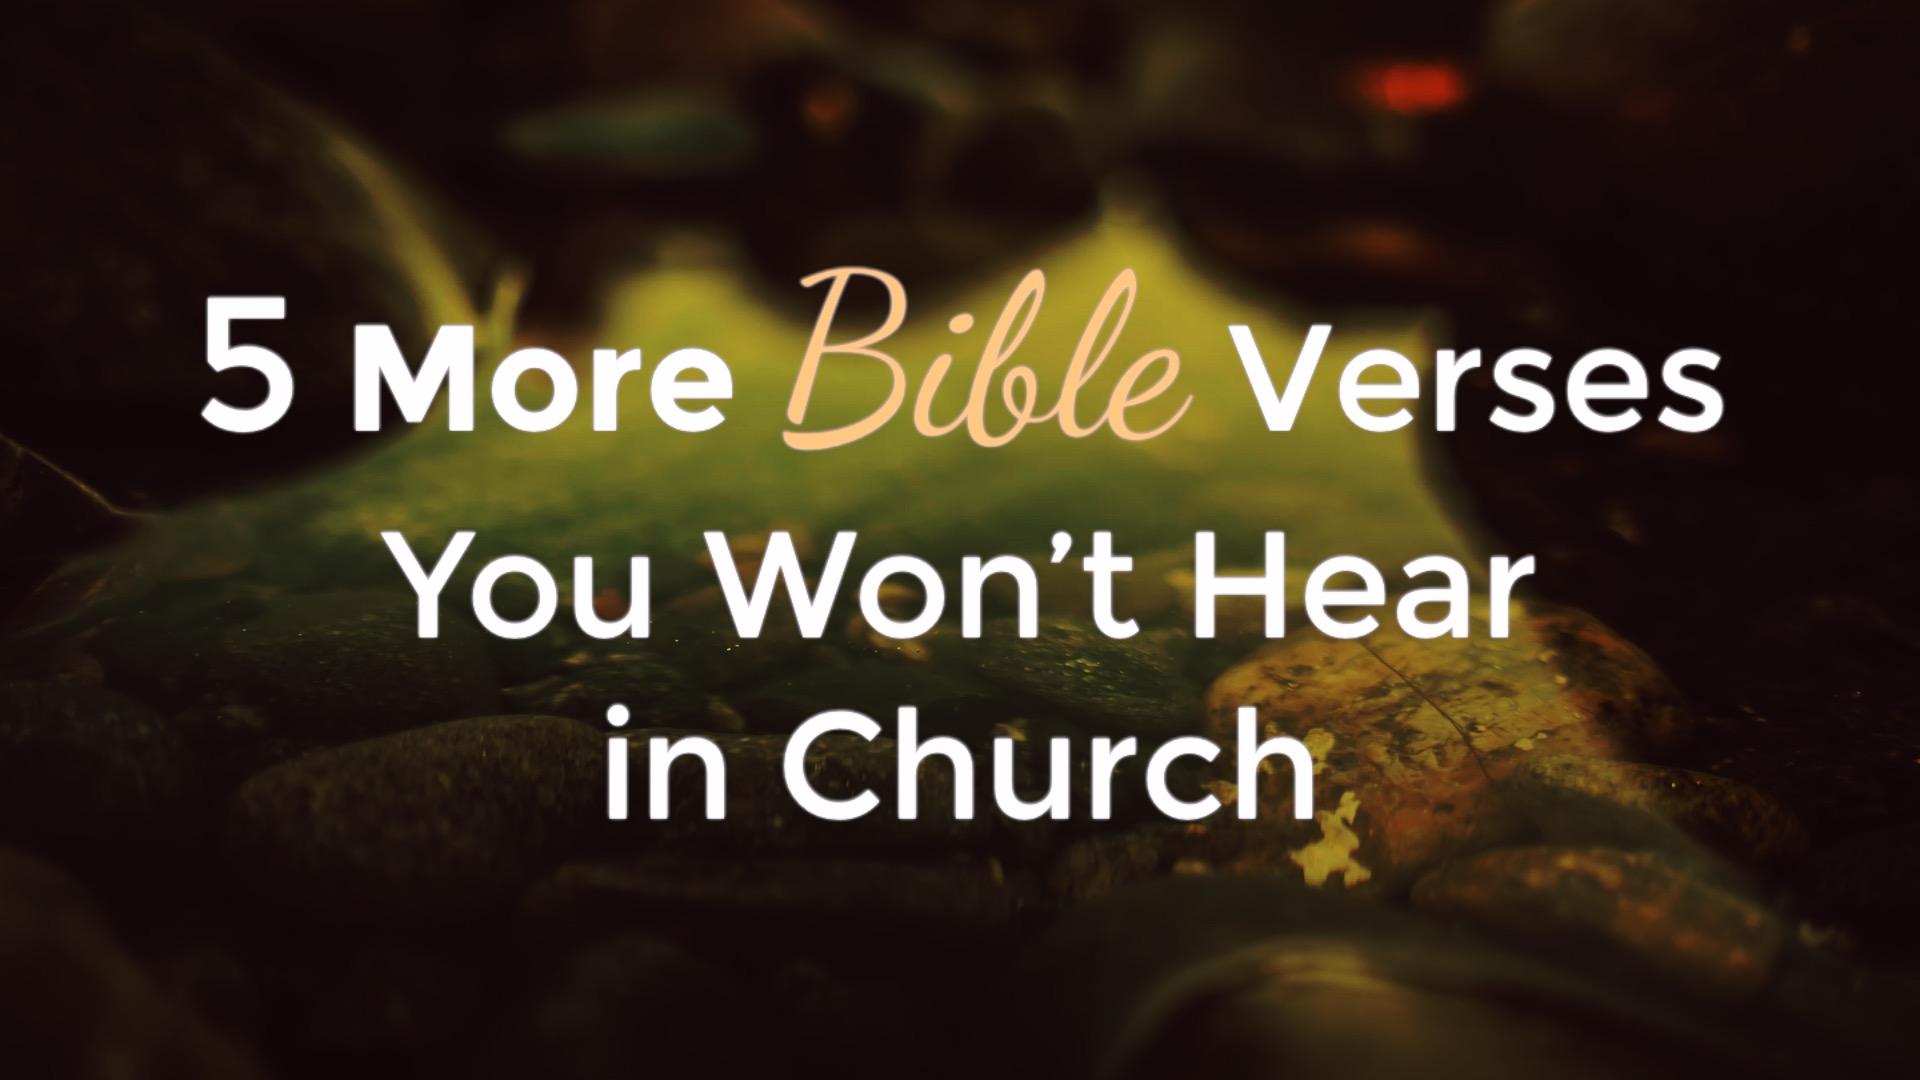 5 More Bible Verses You Won't Hear in Church